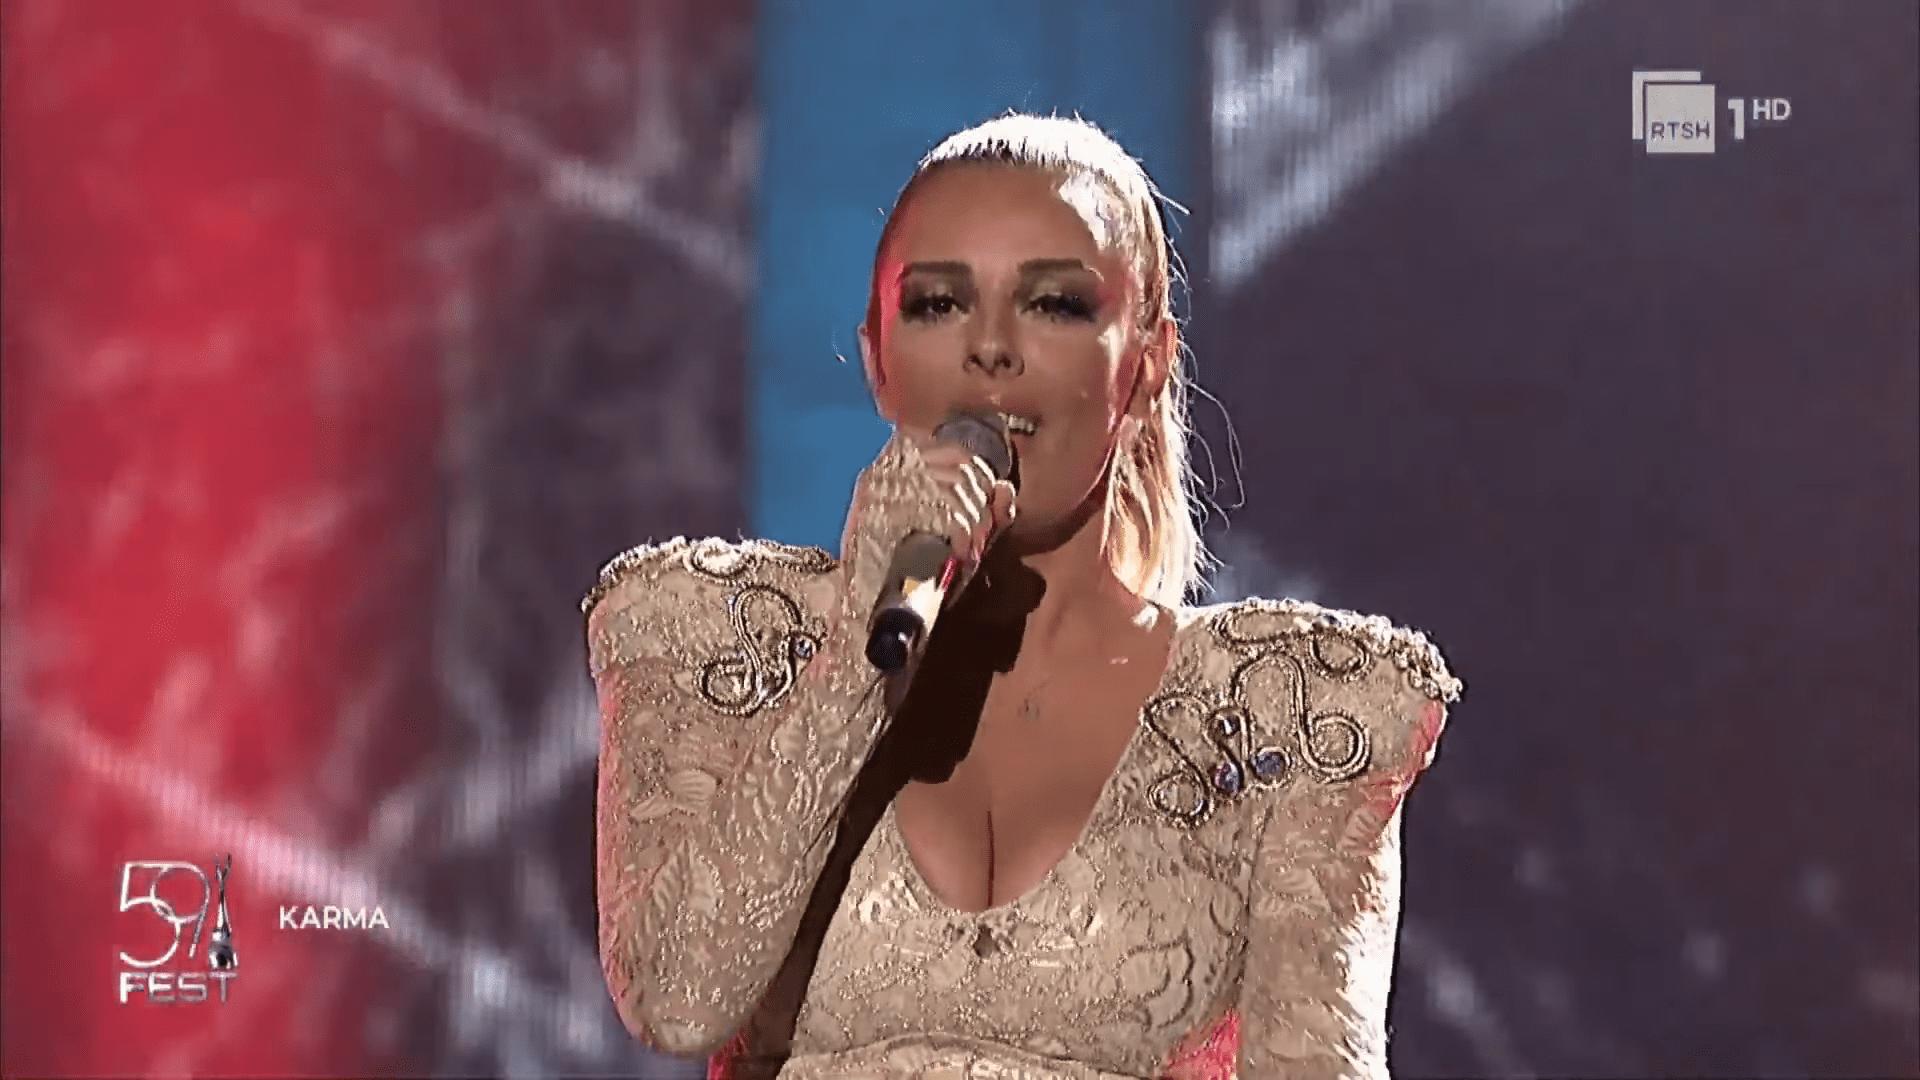 🇦🇱 Anxhela Peristeri will represent Albania at the 2021 Eurovision Song Contest